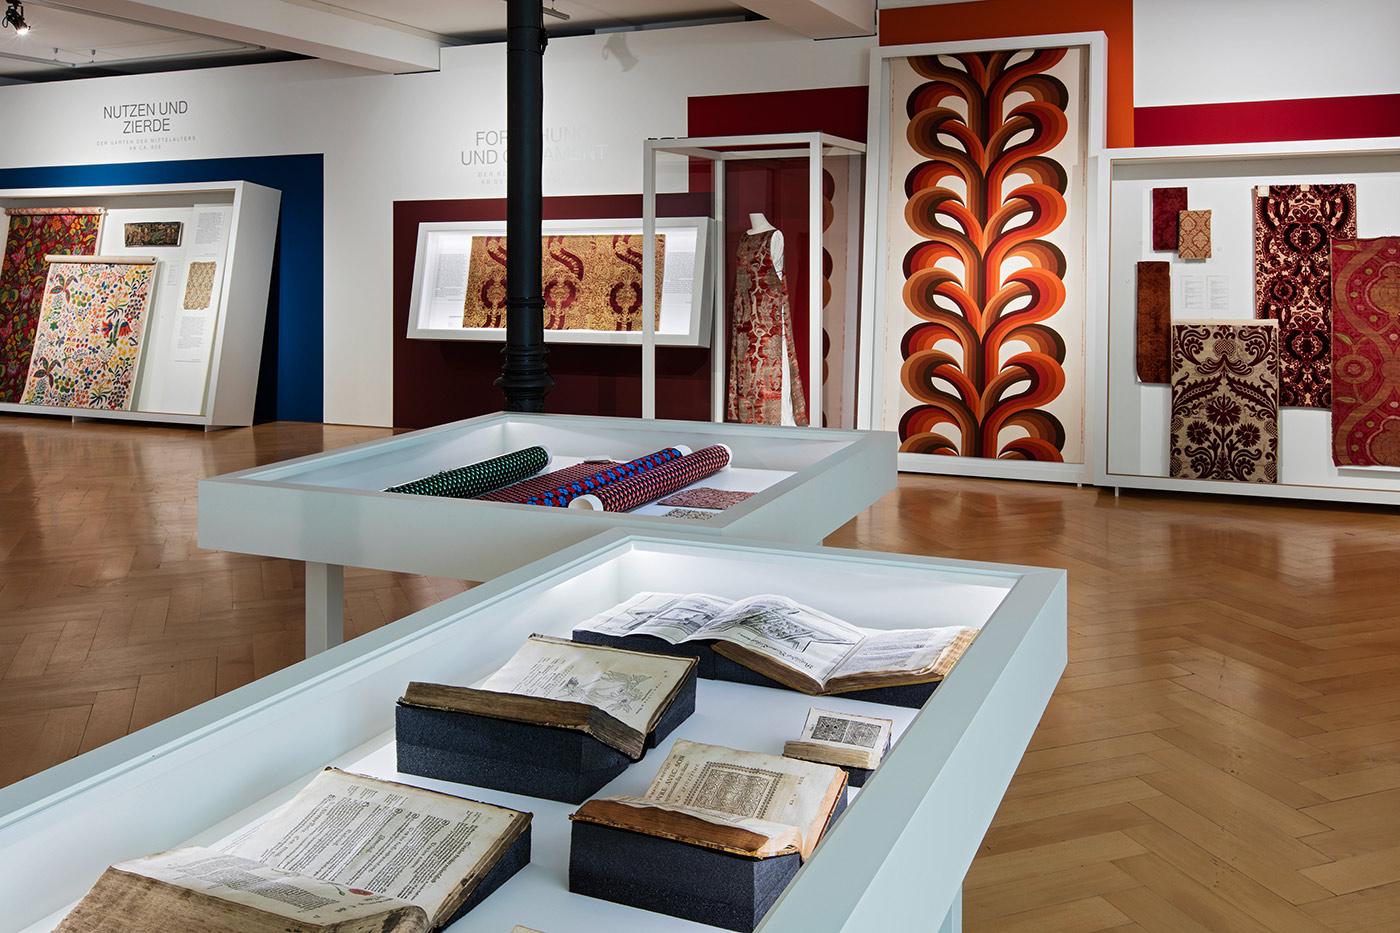 Szenografie-Szenografieren-Ausstellungsgestaltung-Bernhard-Duss